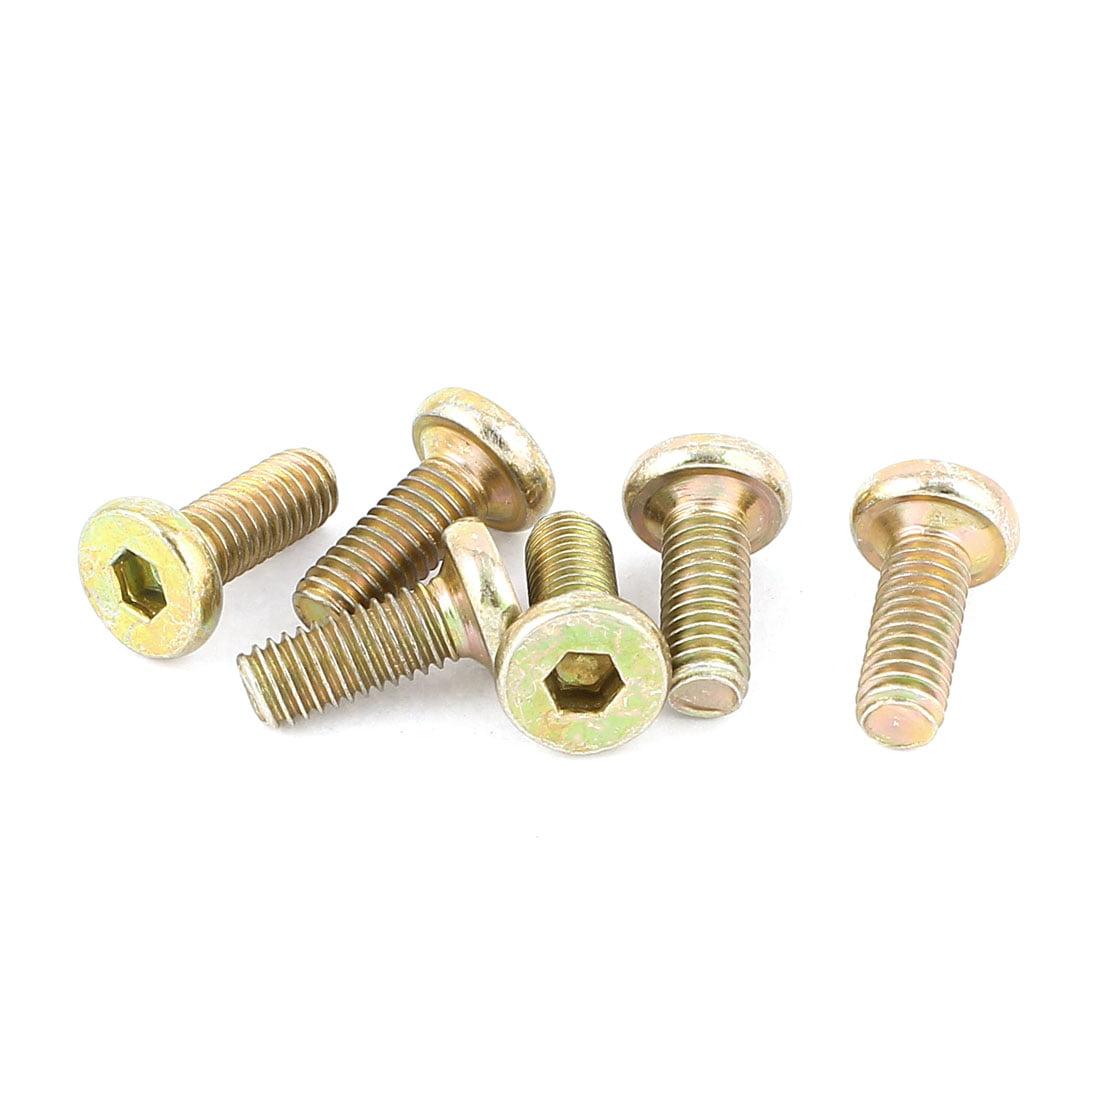 Uxcell M6 x 15mm Threaded Hex Socket Head Cap Screws Bolts Bronze Tone (6-pack)